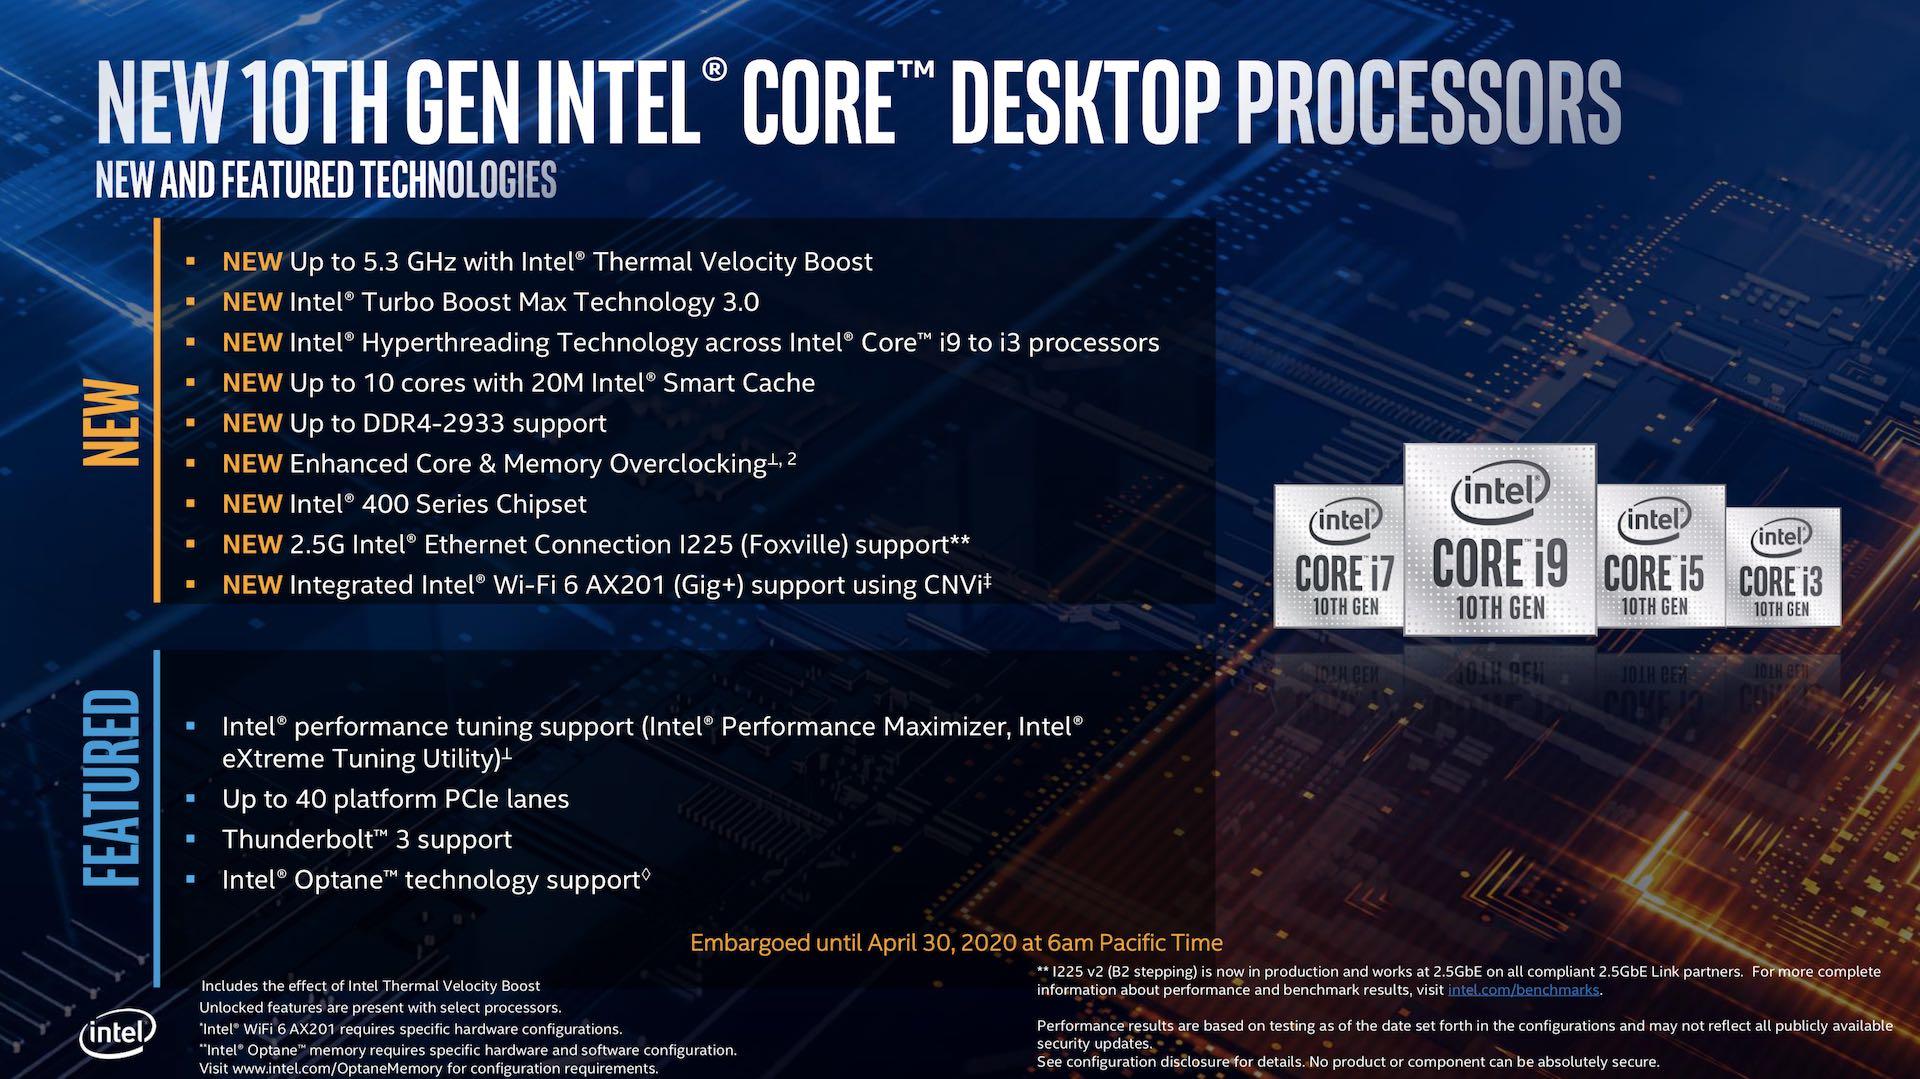 Intel 10th Gen Core i9-10900K and i5-10600K Review - Processors  3